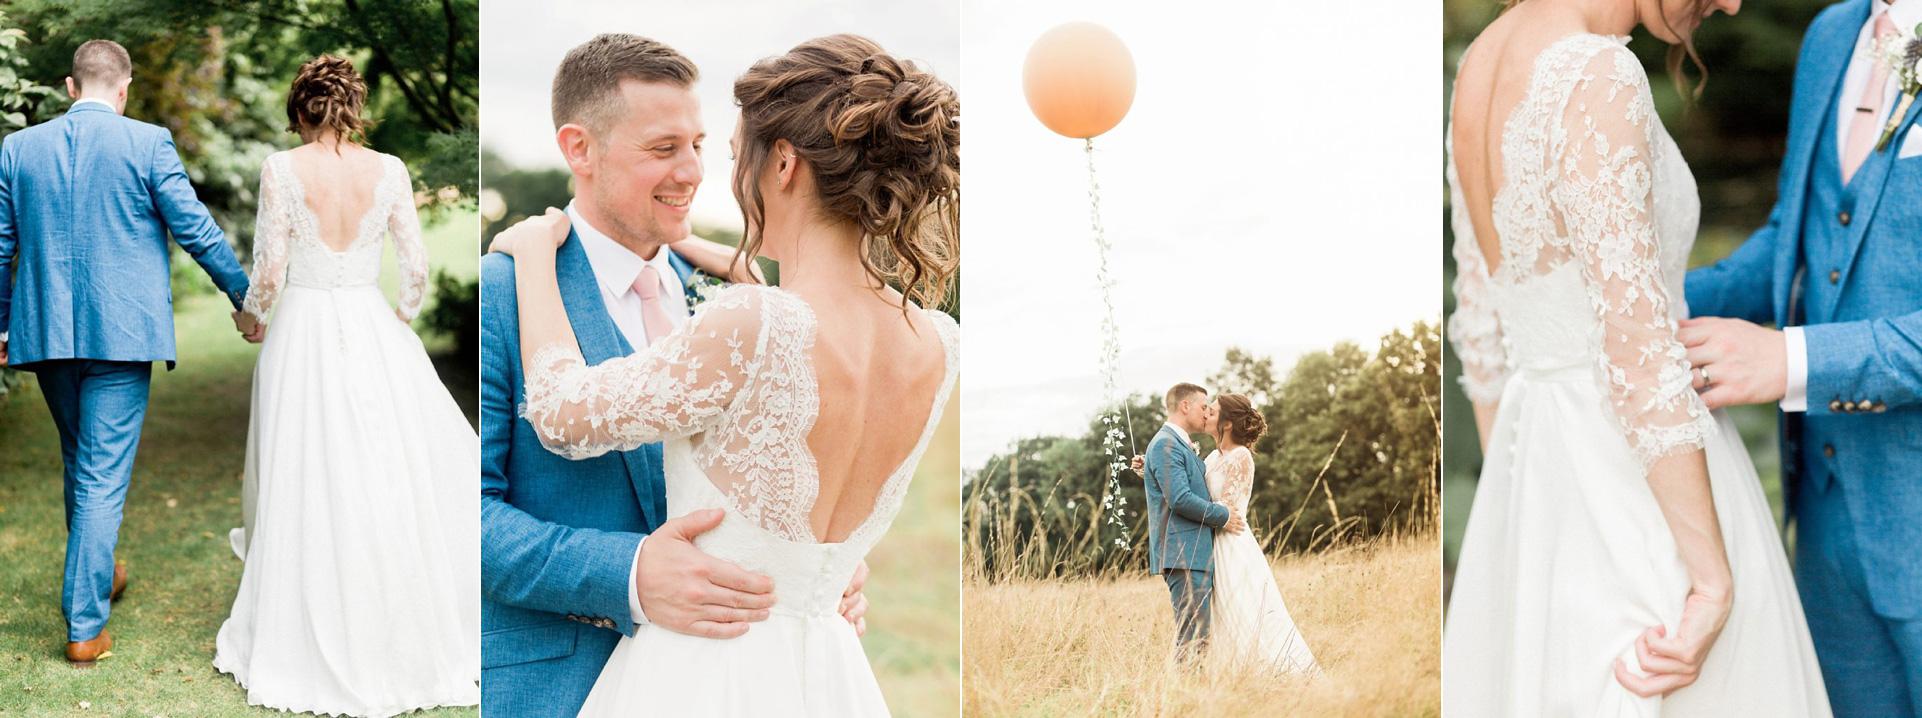 Luxury-Wedding-Photography-by-Fine-Art-Wedding-Photography-Lilybean-Photography-01